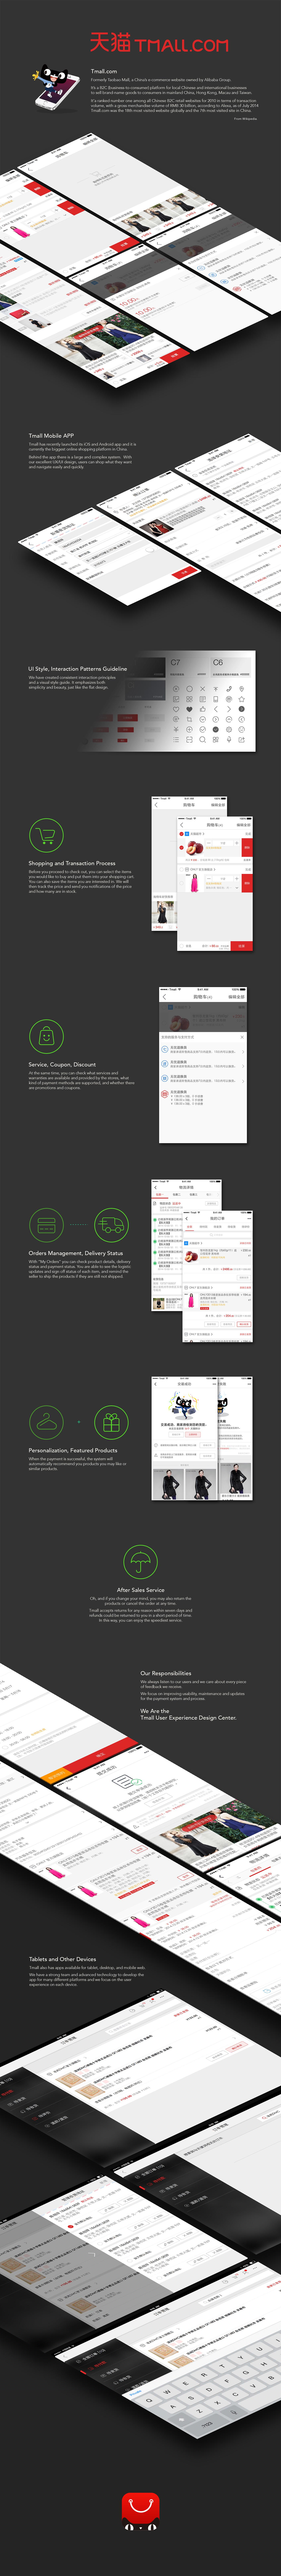 e-commerce Order mobile app purchase Shopping Online shop transaction online retailers online store